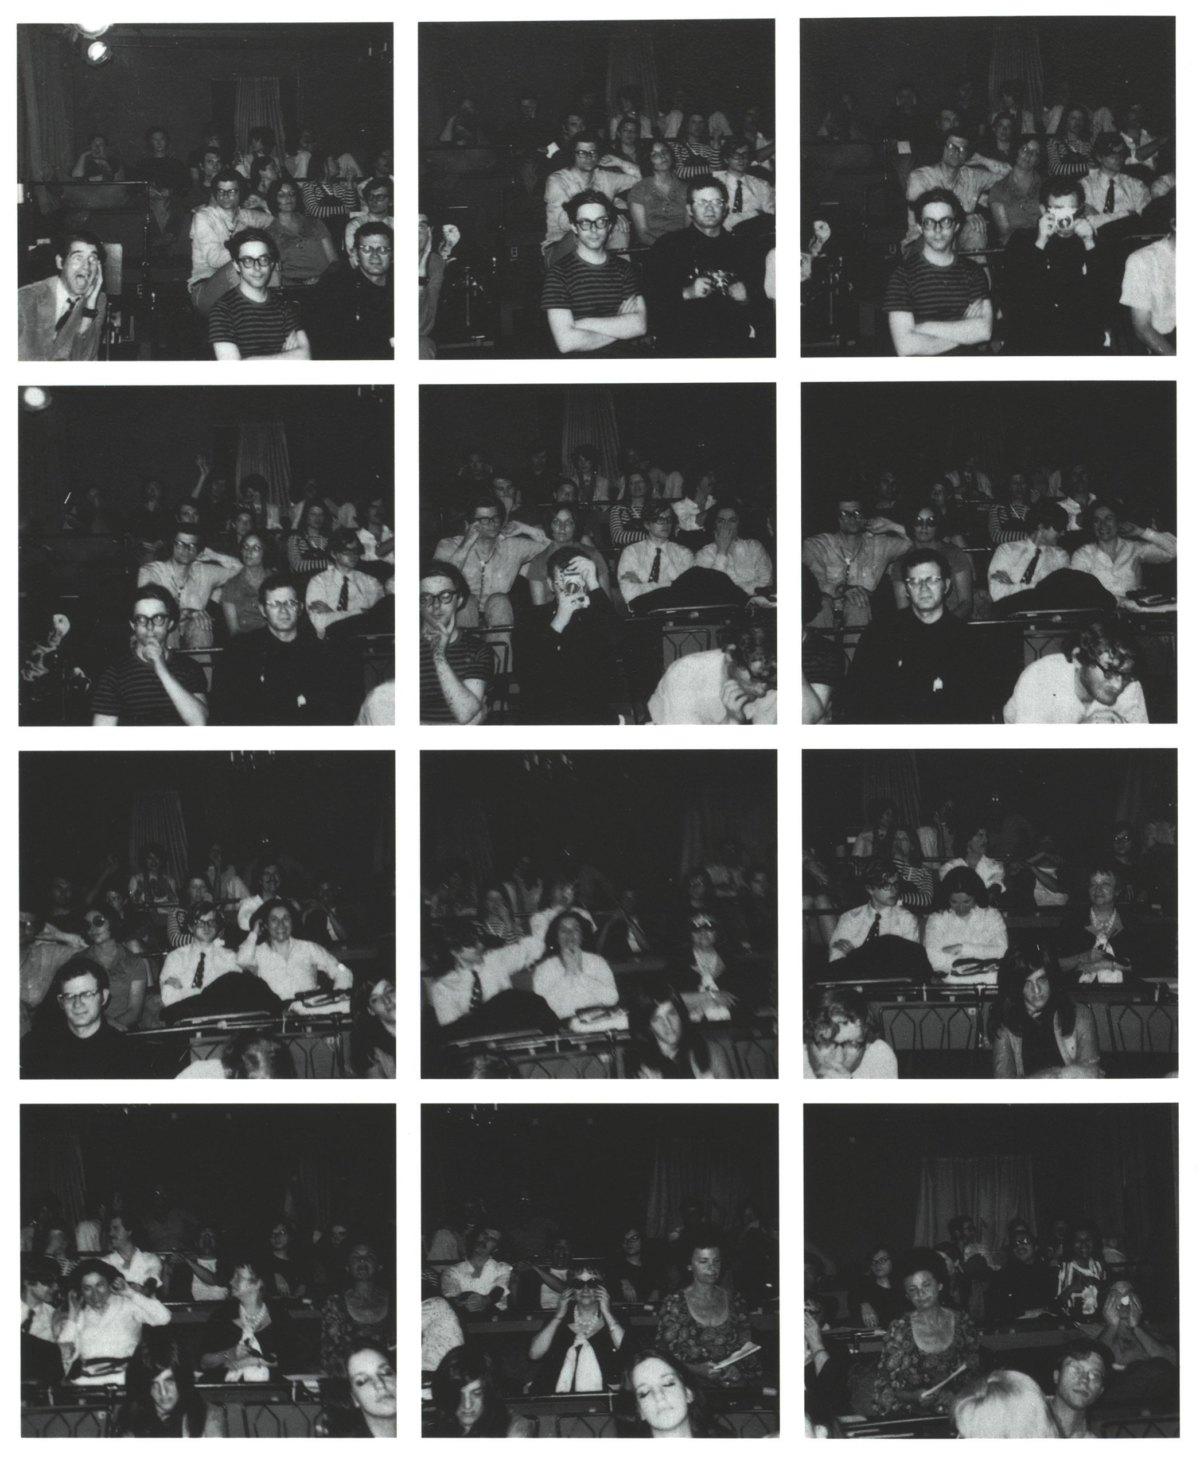 Abb. 1 Vito Acconci: Twelve Pictures, 1969, The Theatre, New York City. Bildfolge nach dem Abdruck in Avalanche 6 (1972), S. 44. © Vito Acconci.